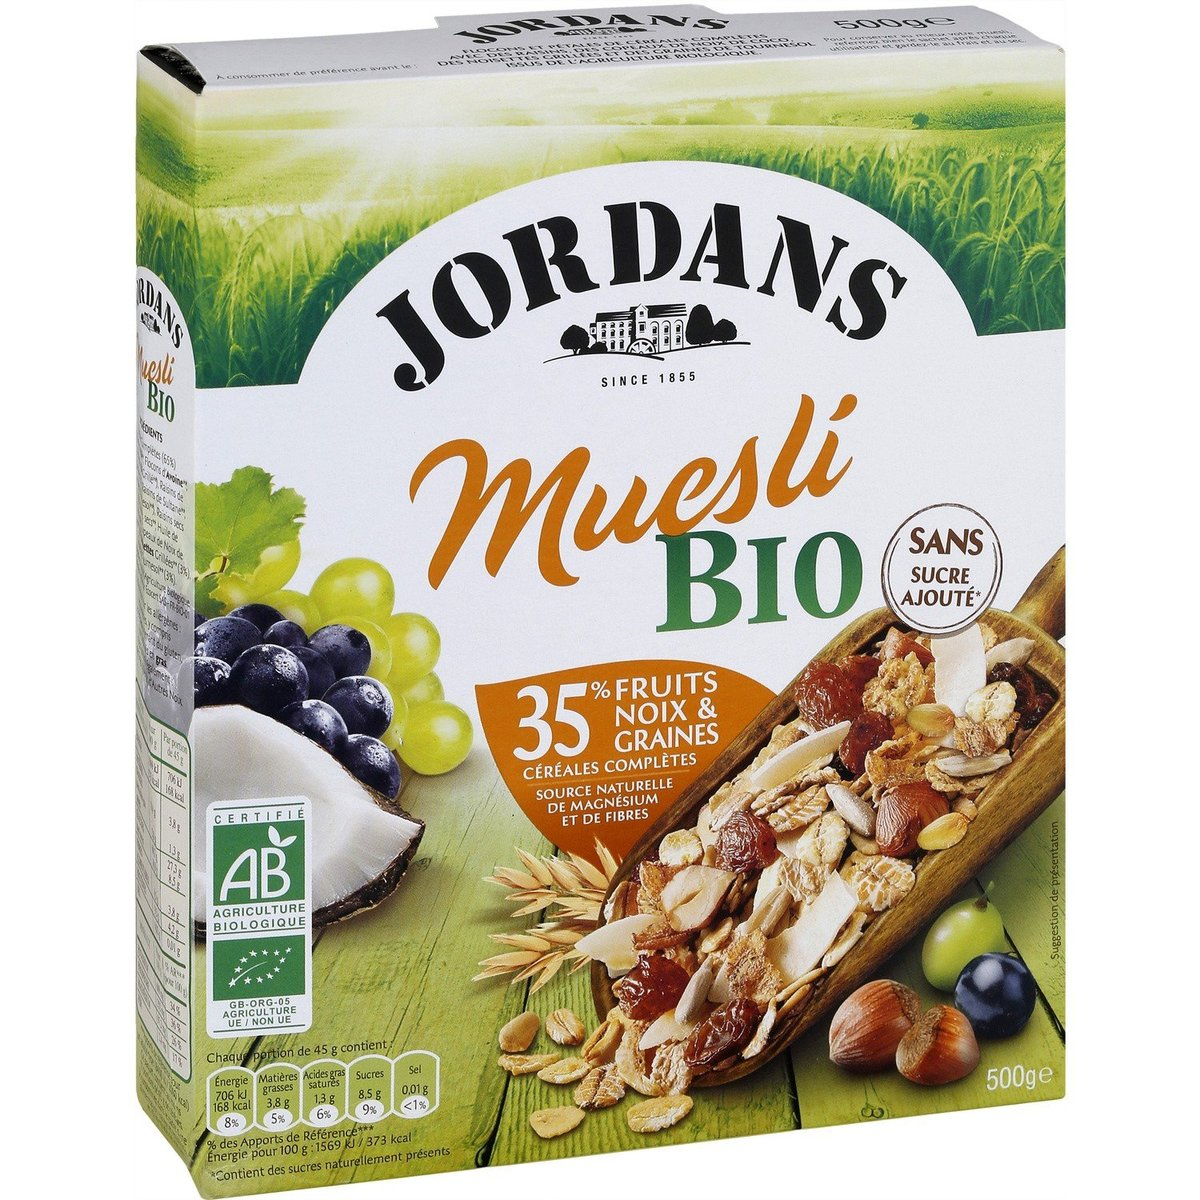 Direct from France - JORDANS - Orangic Grapes & Hazelnut Muesli - 500g